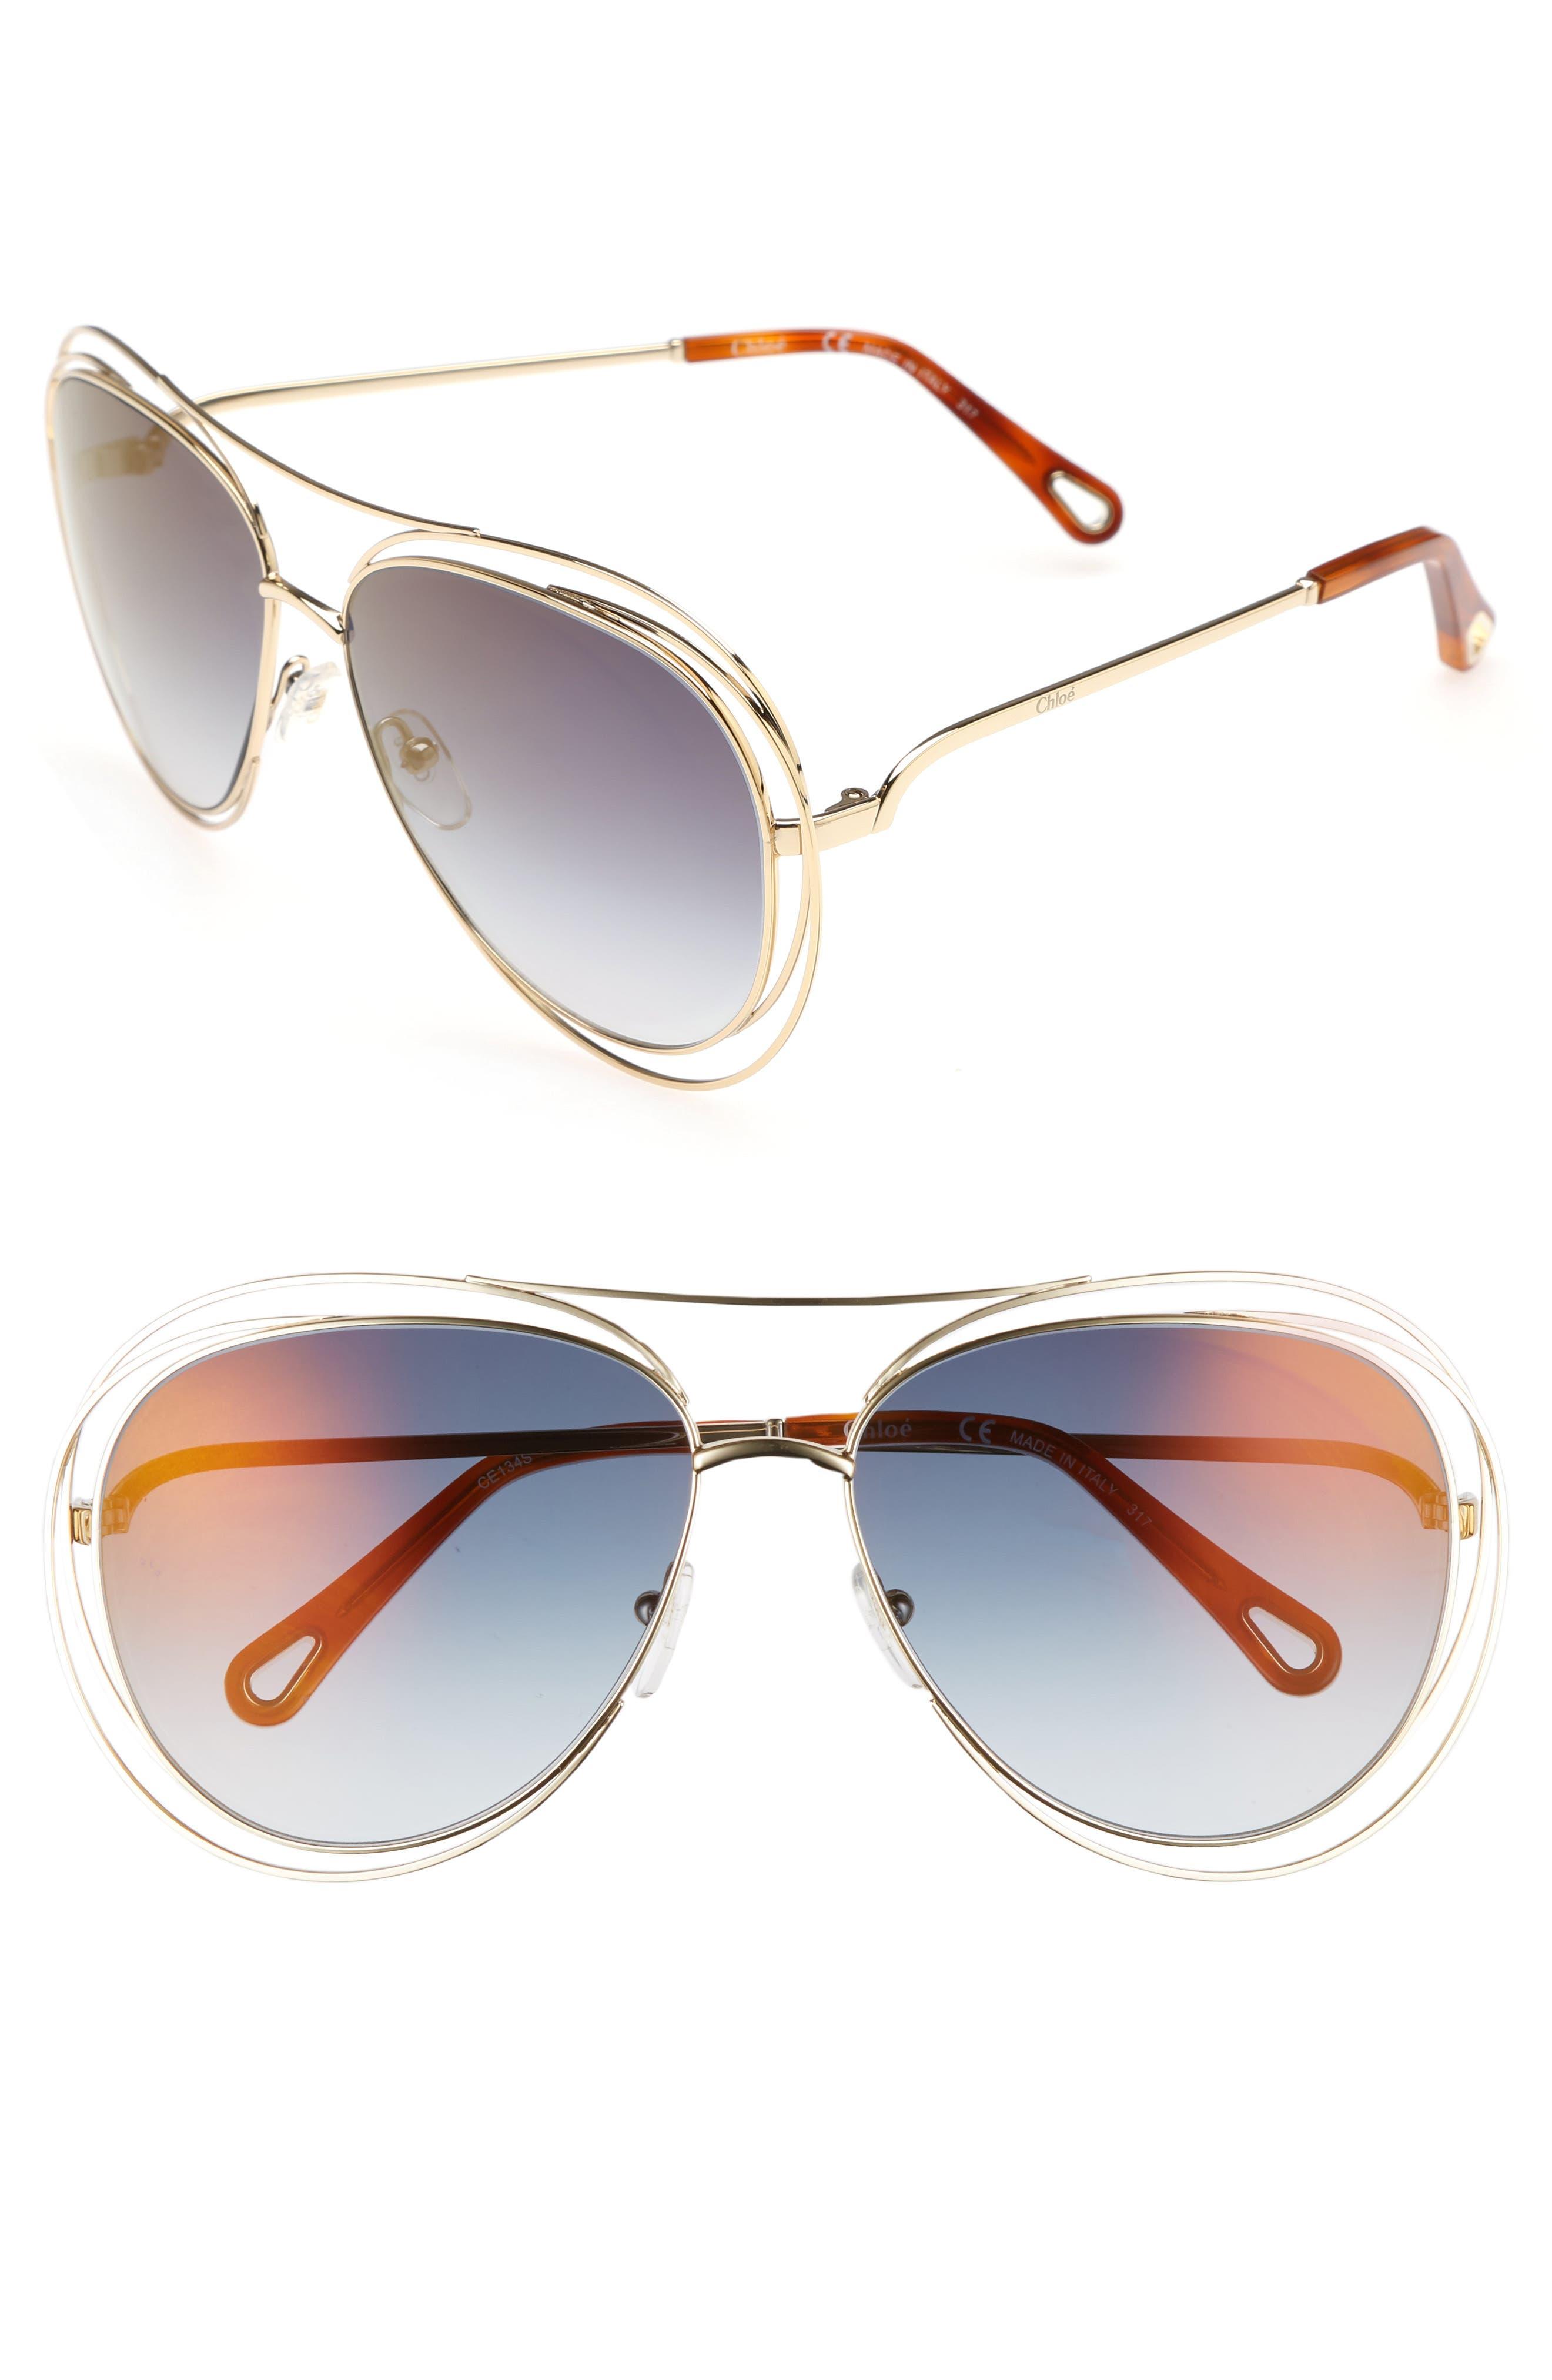 Chloe 61Mm Aviator Sunglasses - Gold/ Havana/ Flash Blue